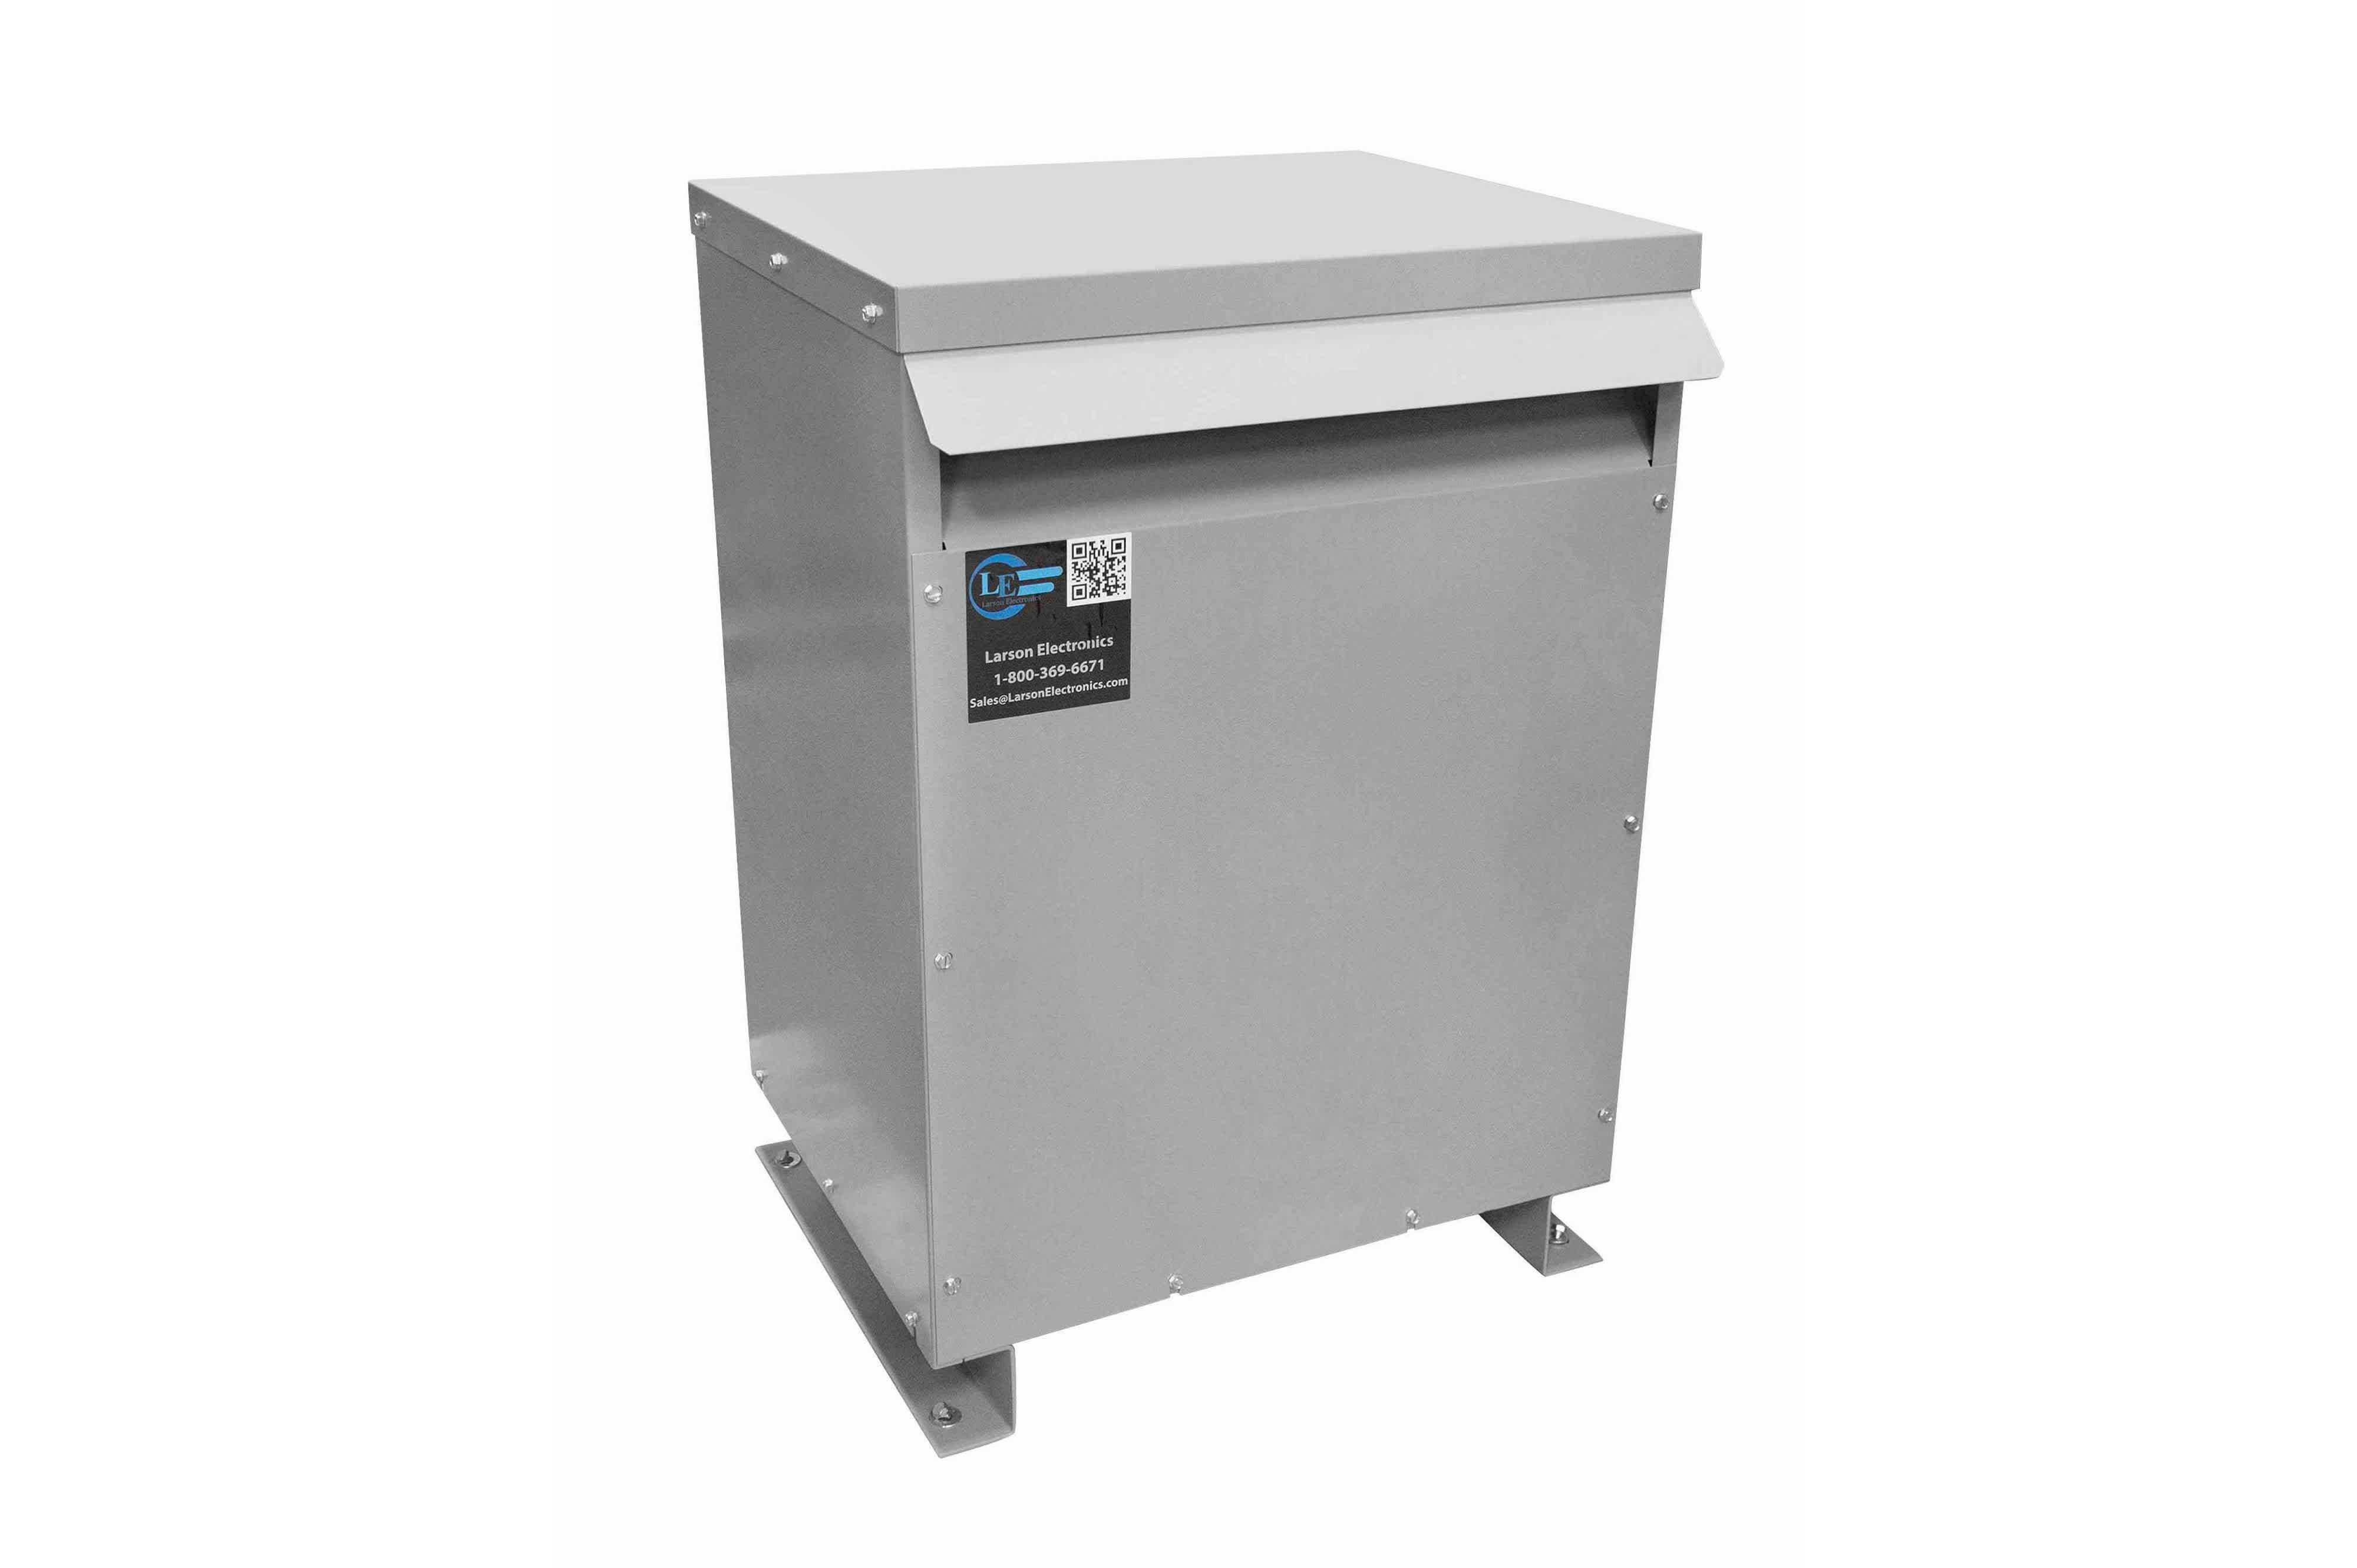 750 kVA 3PH Isolation Transformer, 600V Wye Primary, 400V Delta Secondary, N3R, Ventilated, 60 Hz